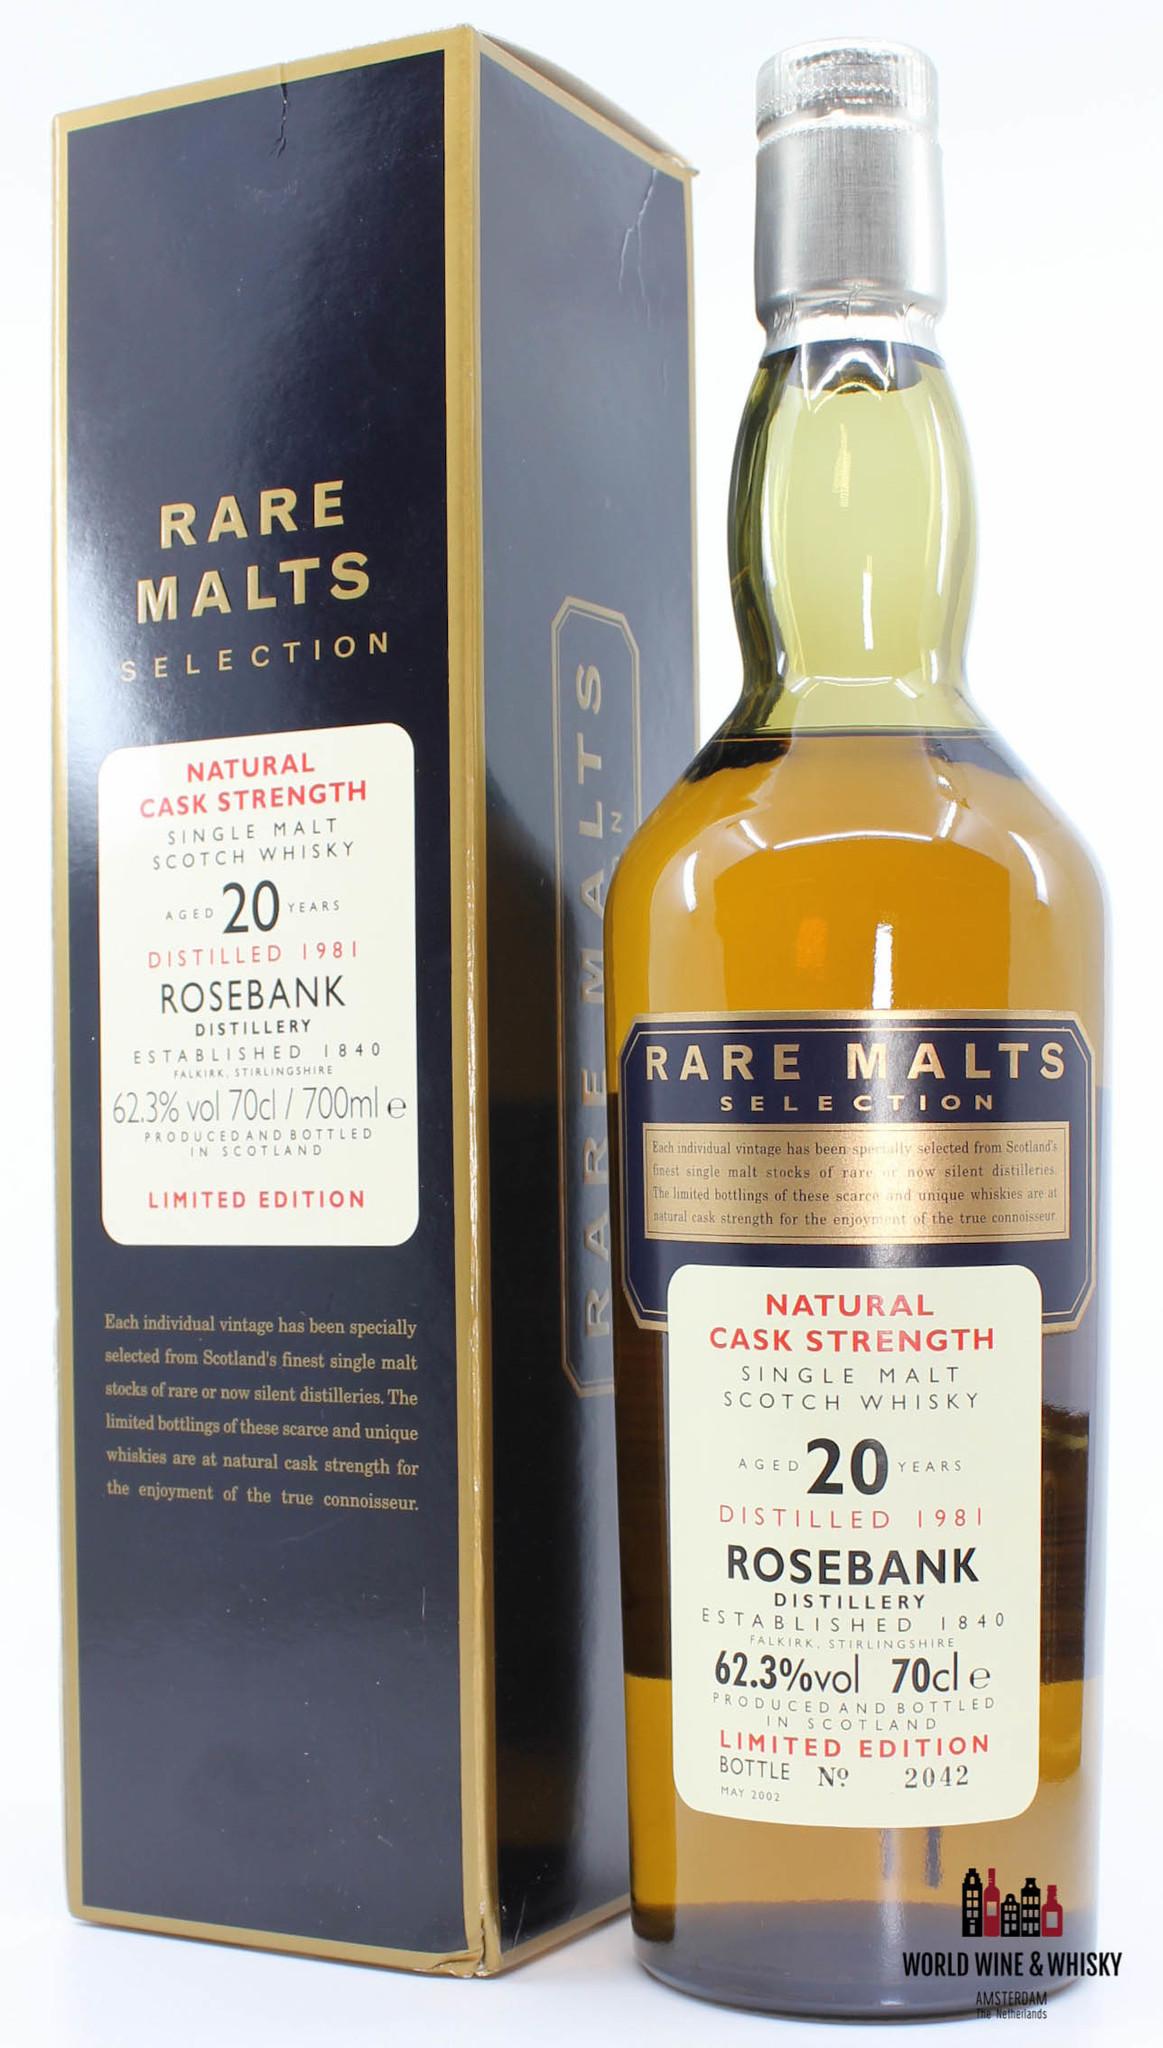 Rosebank Rosebank 20 Years Old 1981 2002 Rare Malts Selection 62.3% in cardboard case (Decommissioned)